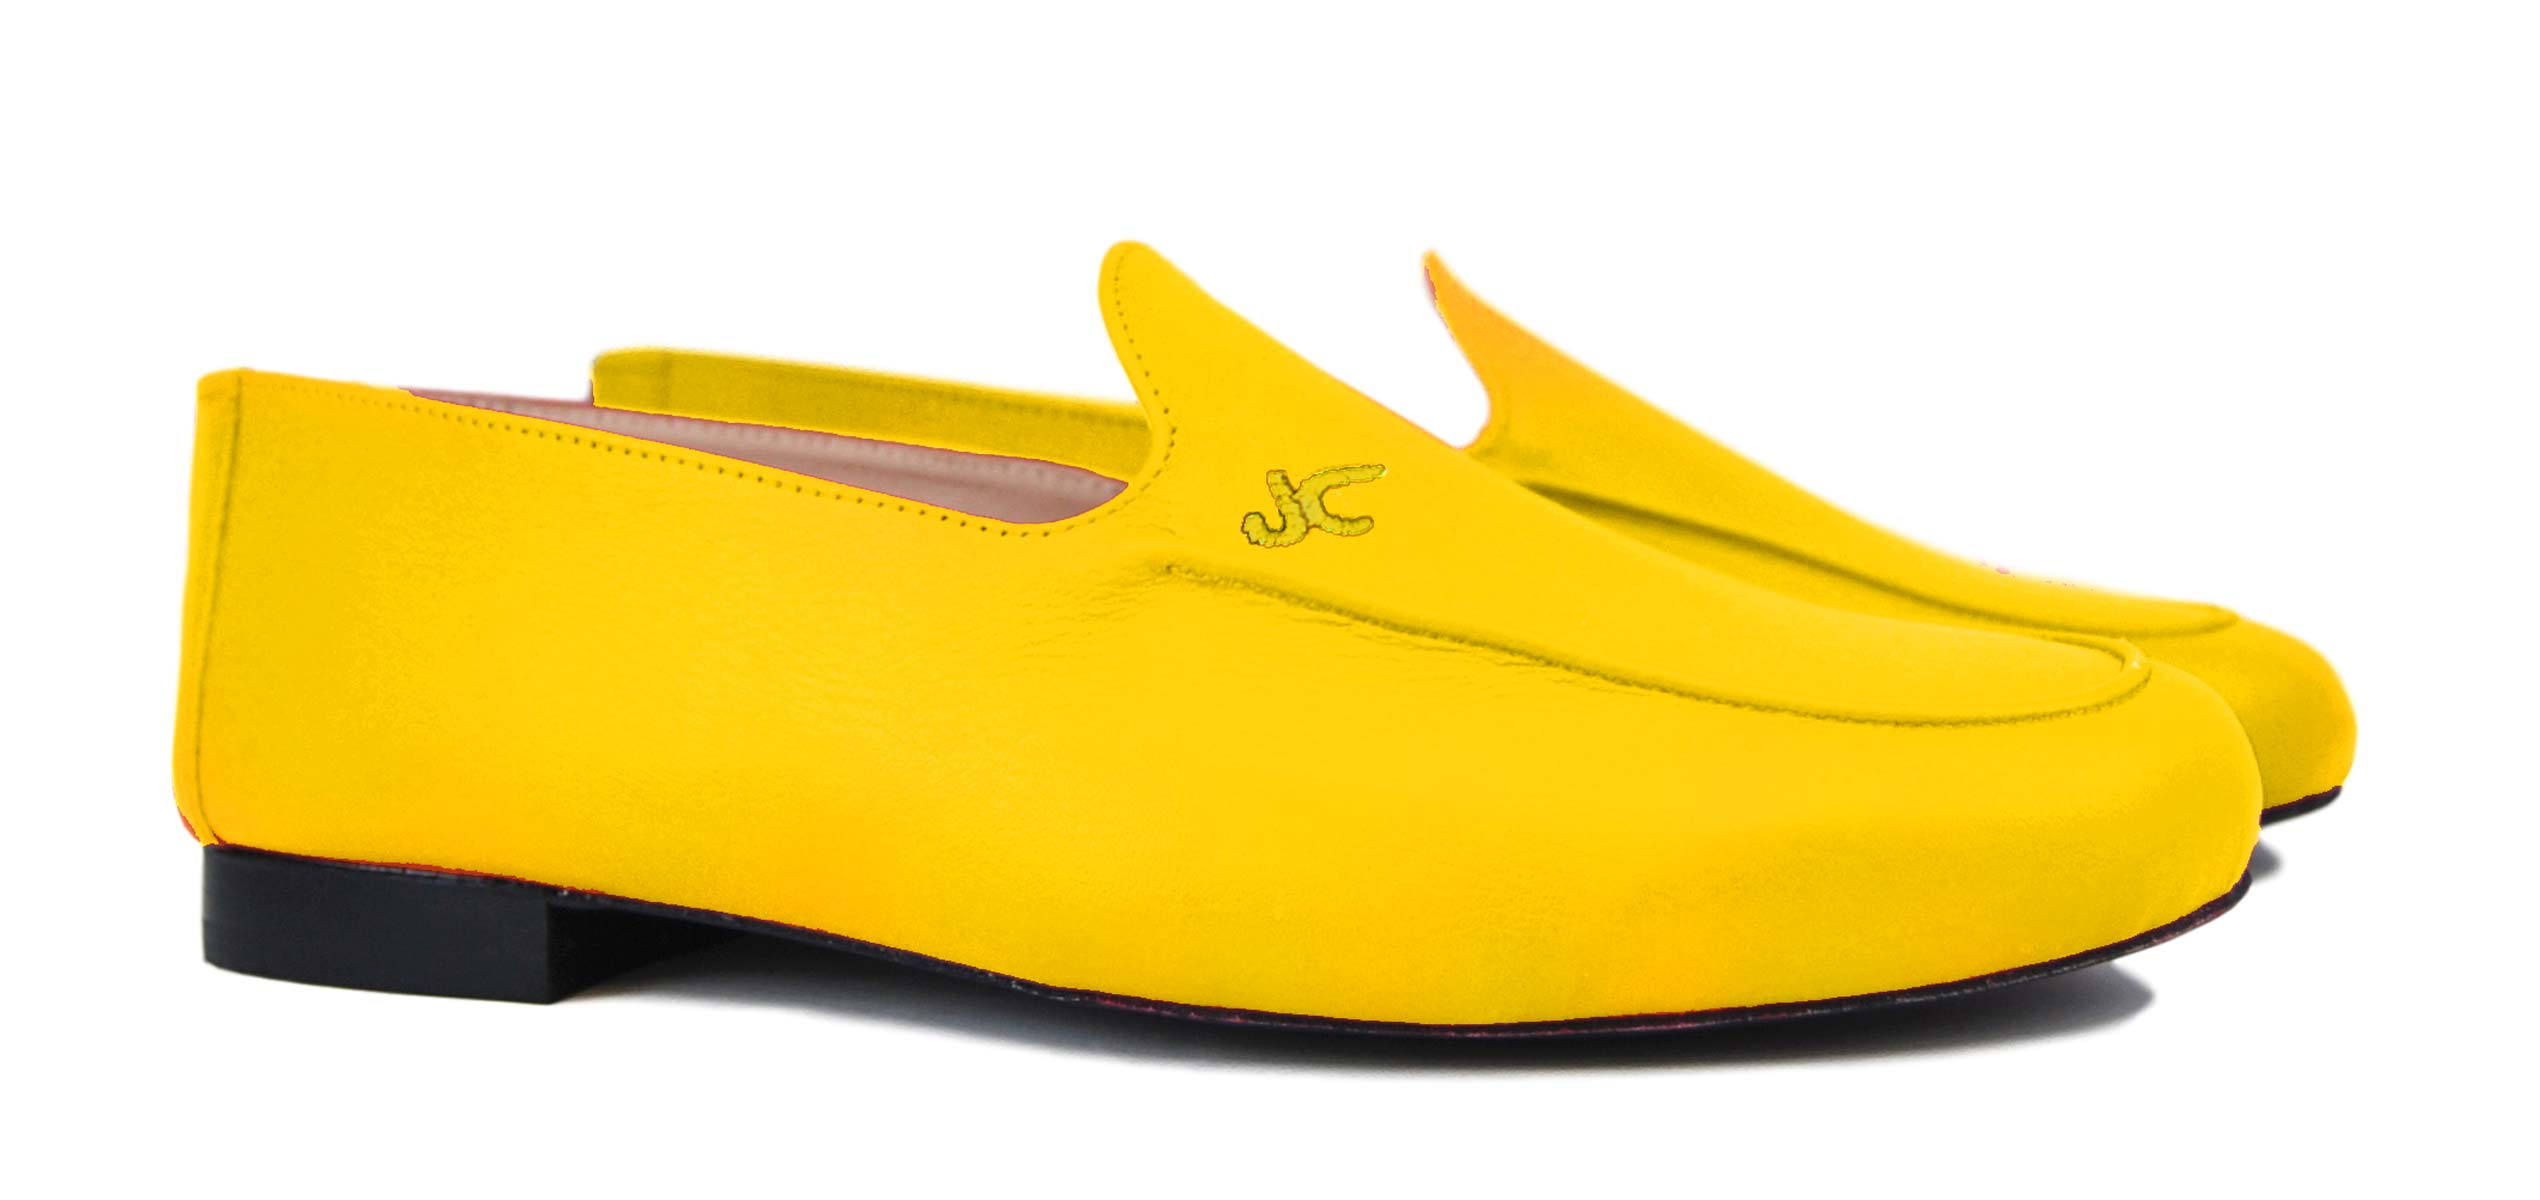 Foto 5 de Zapatos Julio Iglesias 528 JC Limón Napa